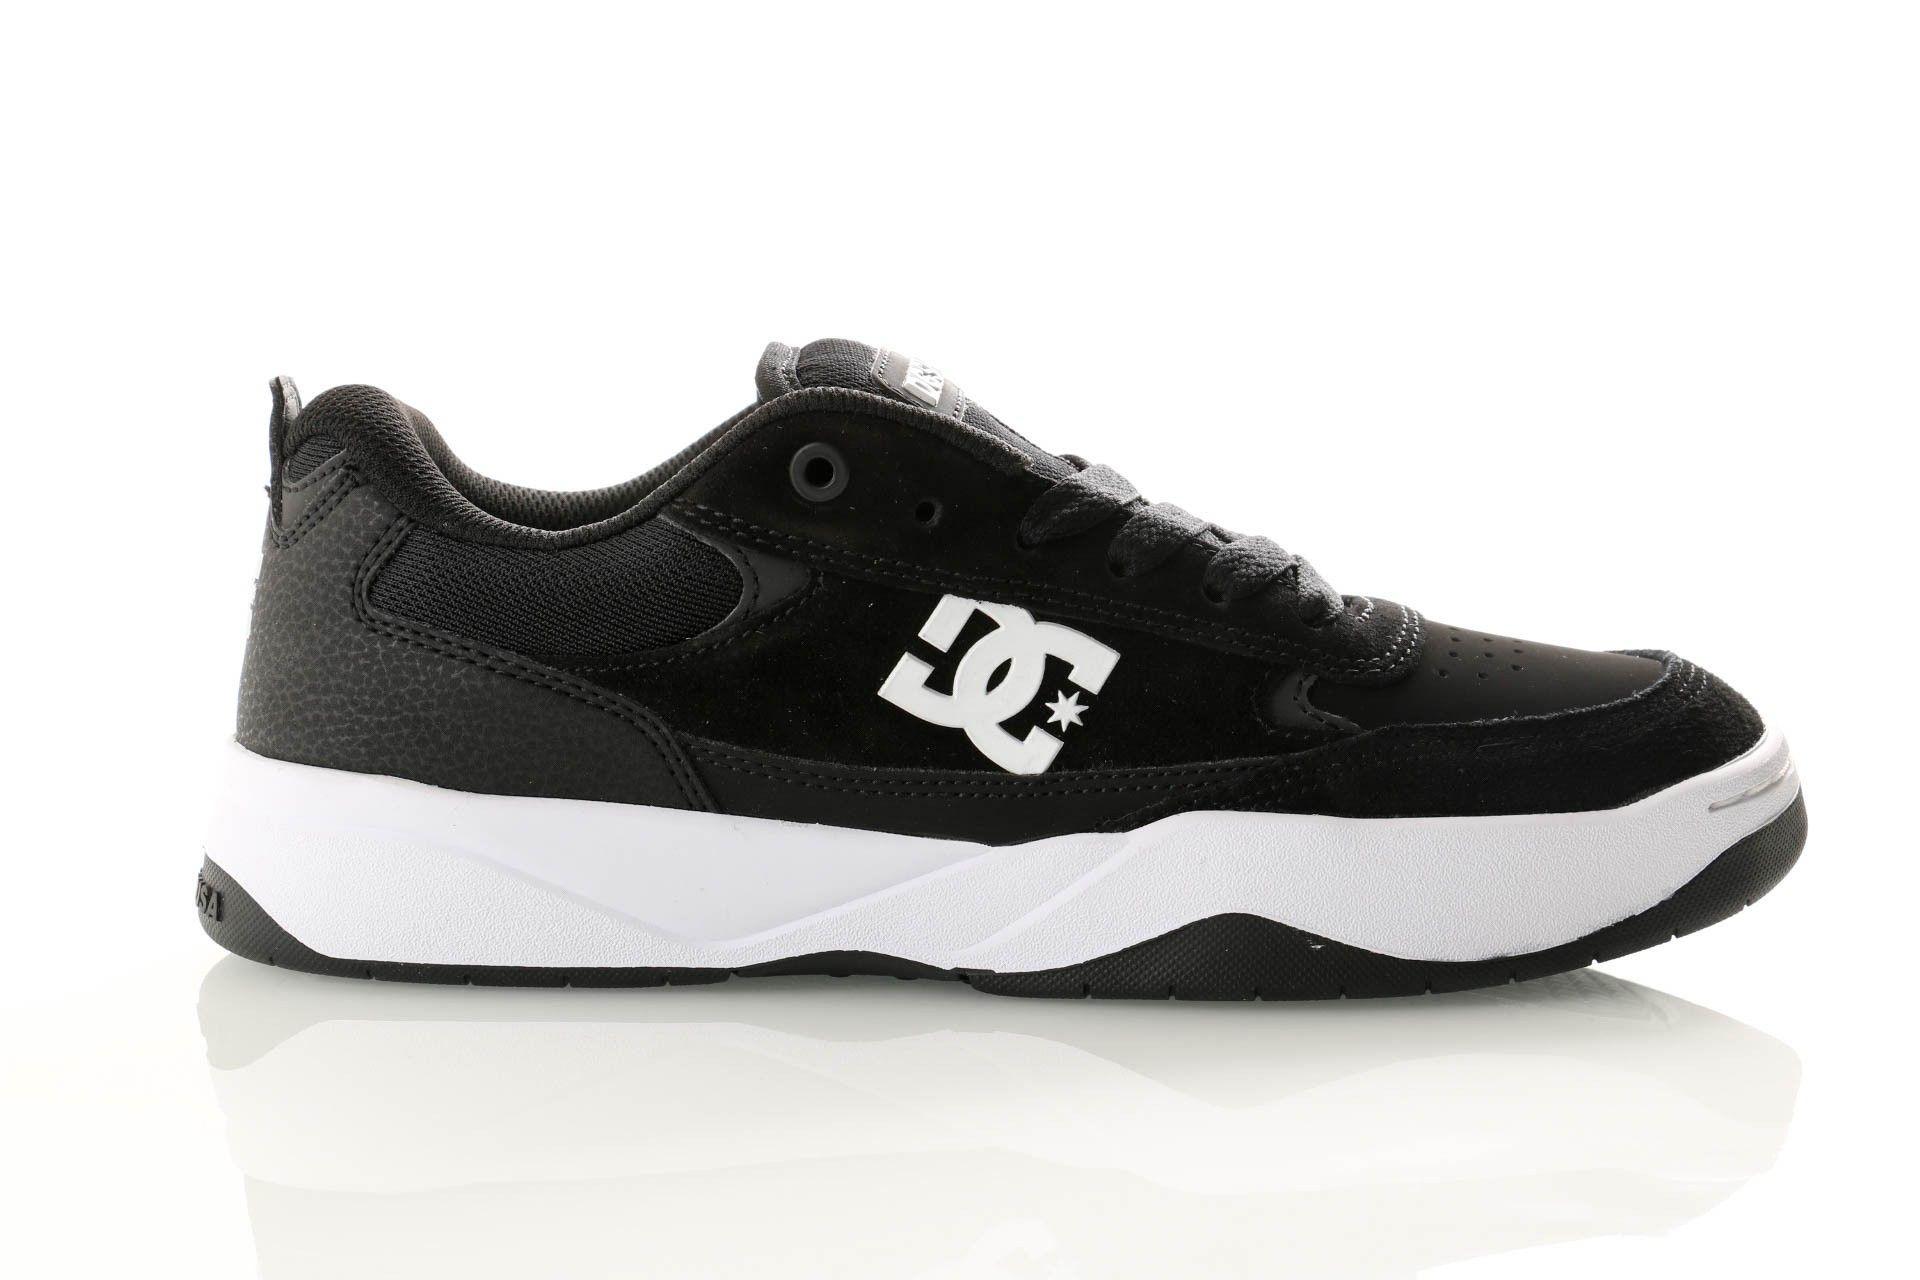 Afbeelding van Dc Penza M Shoe Bkw Adys100509 Sneakers Black/White